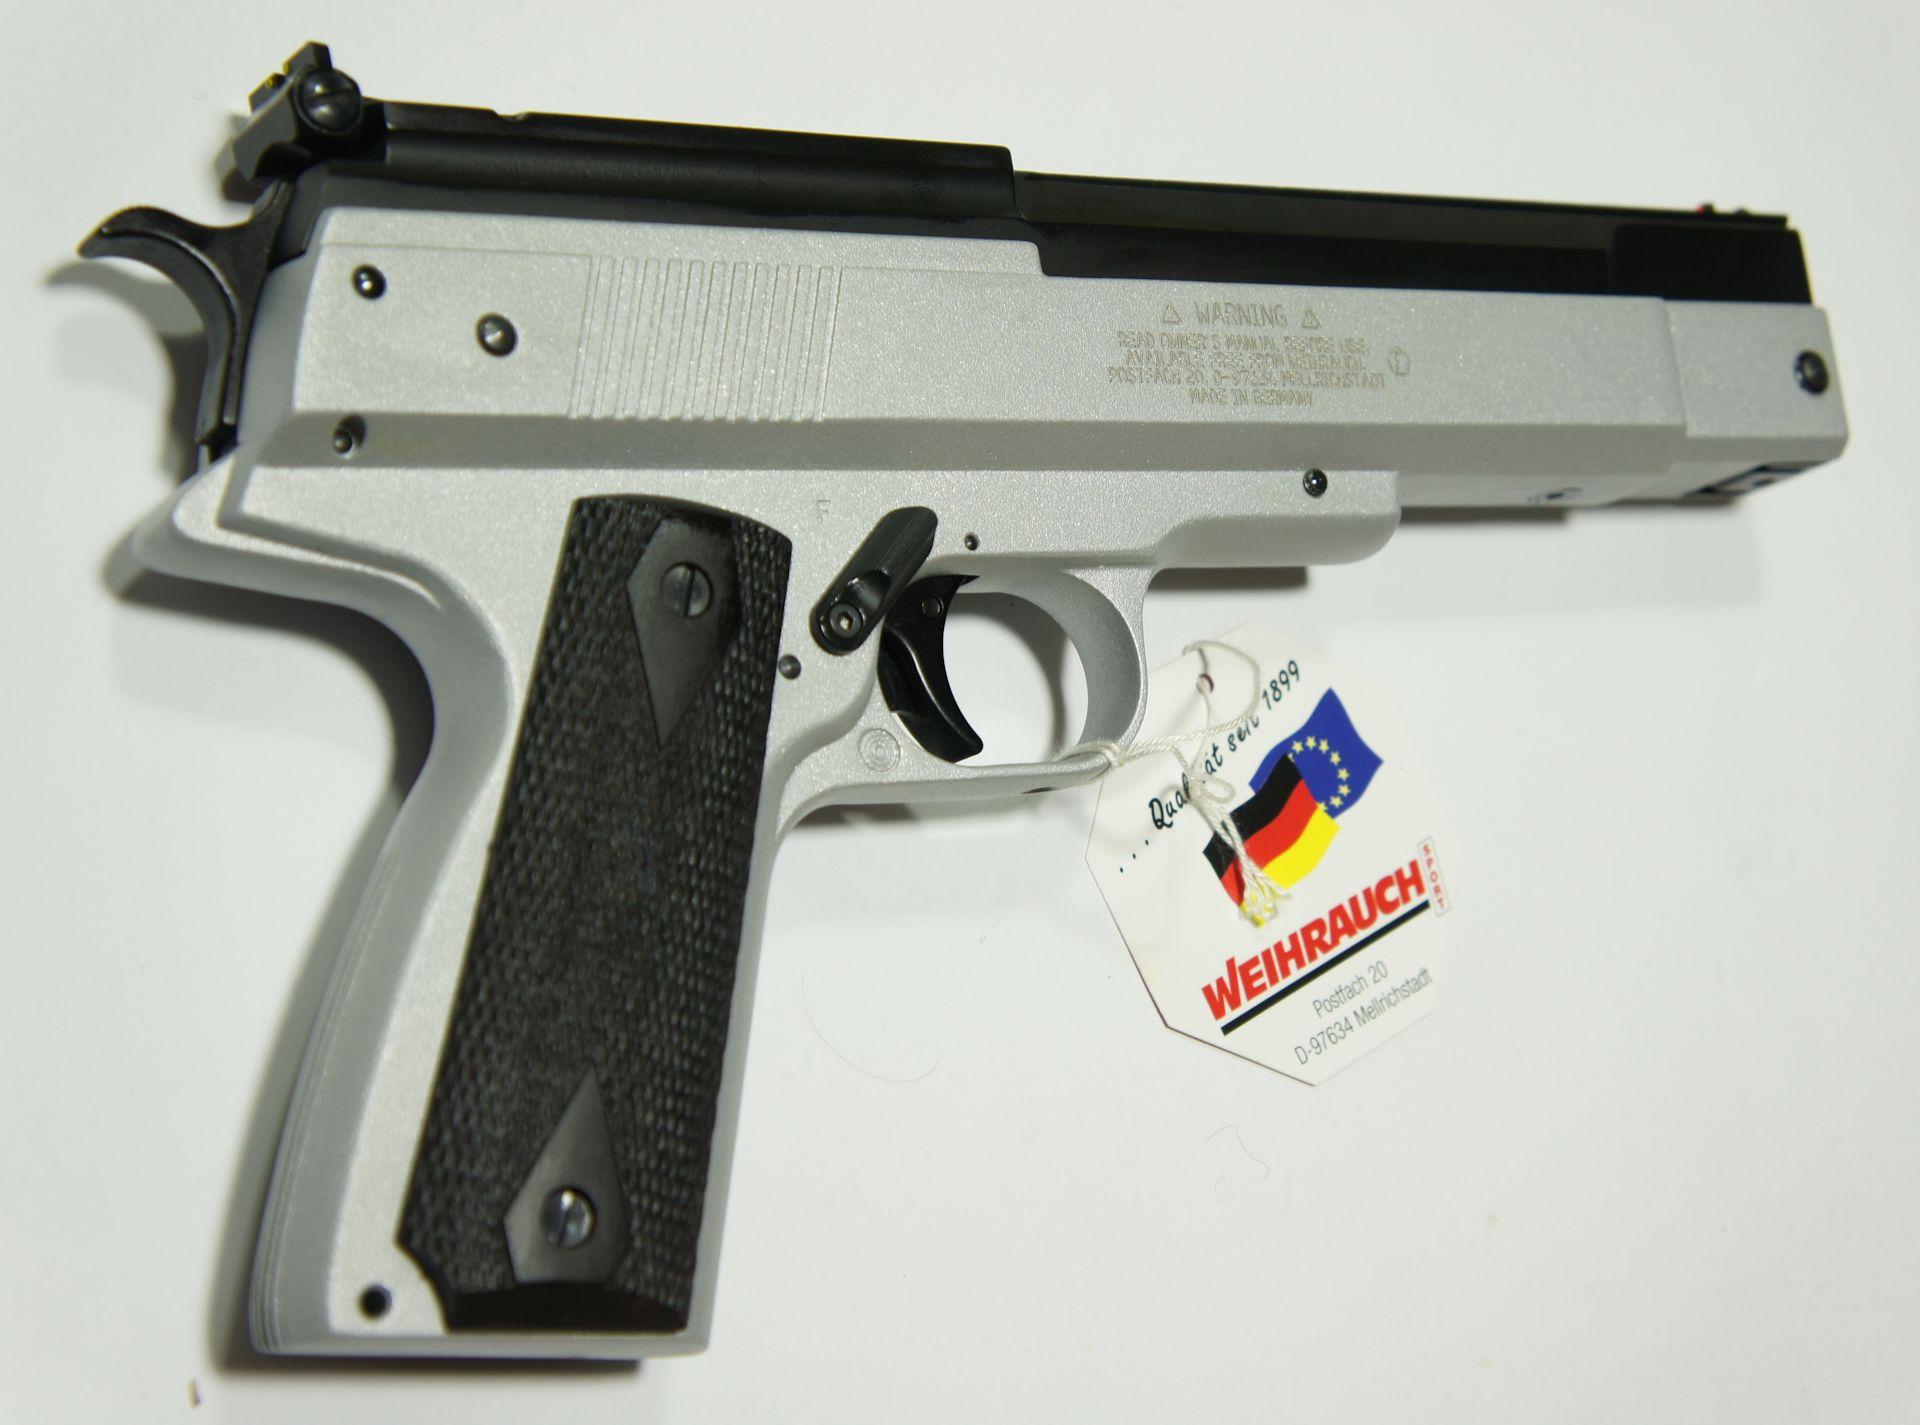 Luftpistole HW 45 Kaliber 4,5mm, Silberfinis